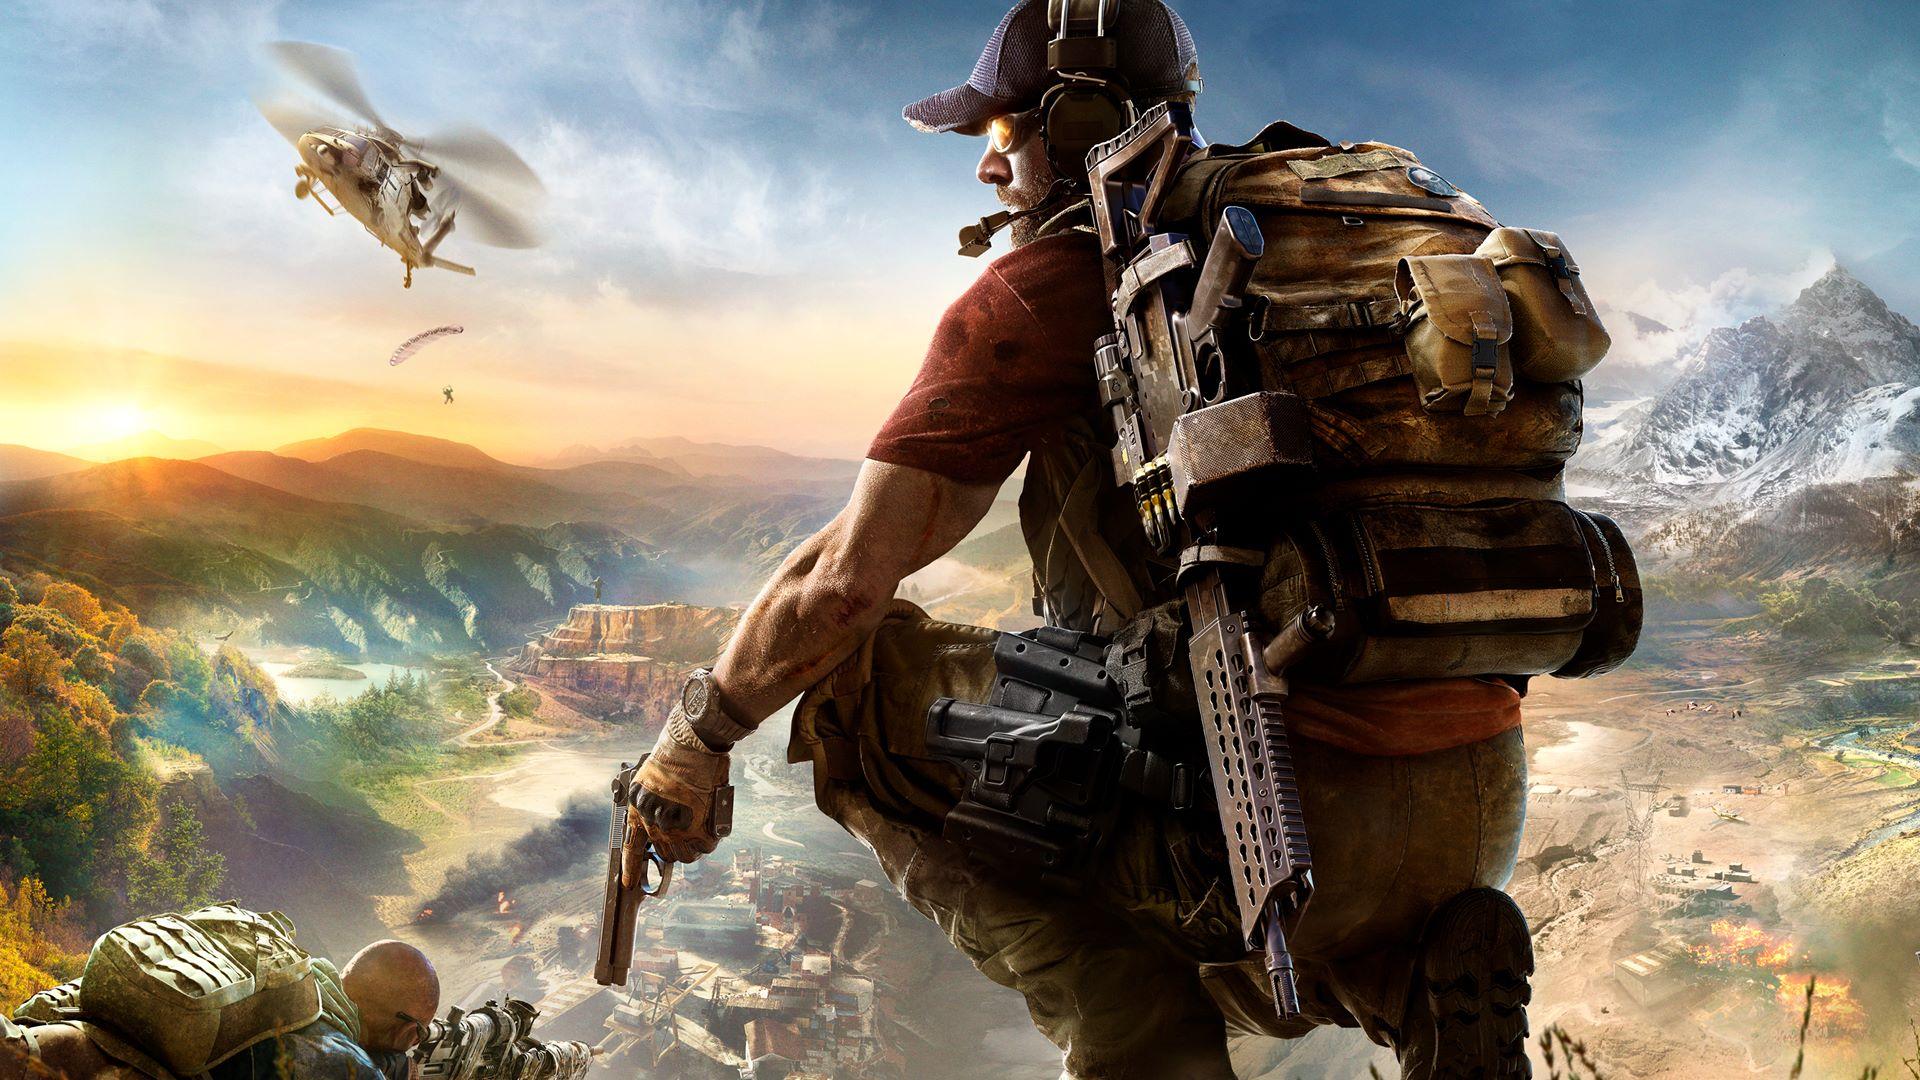 Photo of إشاعة : الكشف عن لعبة Tom Clancy's Ghost Recon® Wildlands 2 بتاريخ 9 مايو القادم .